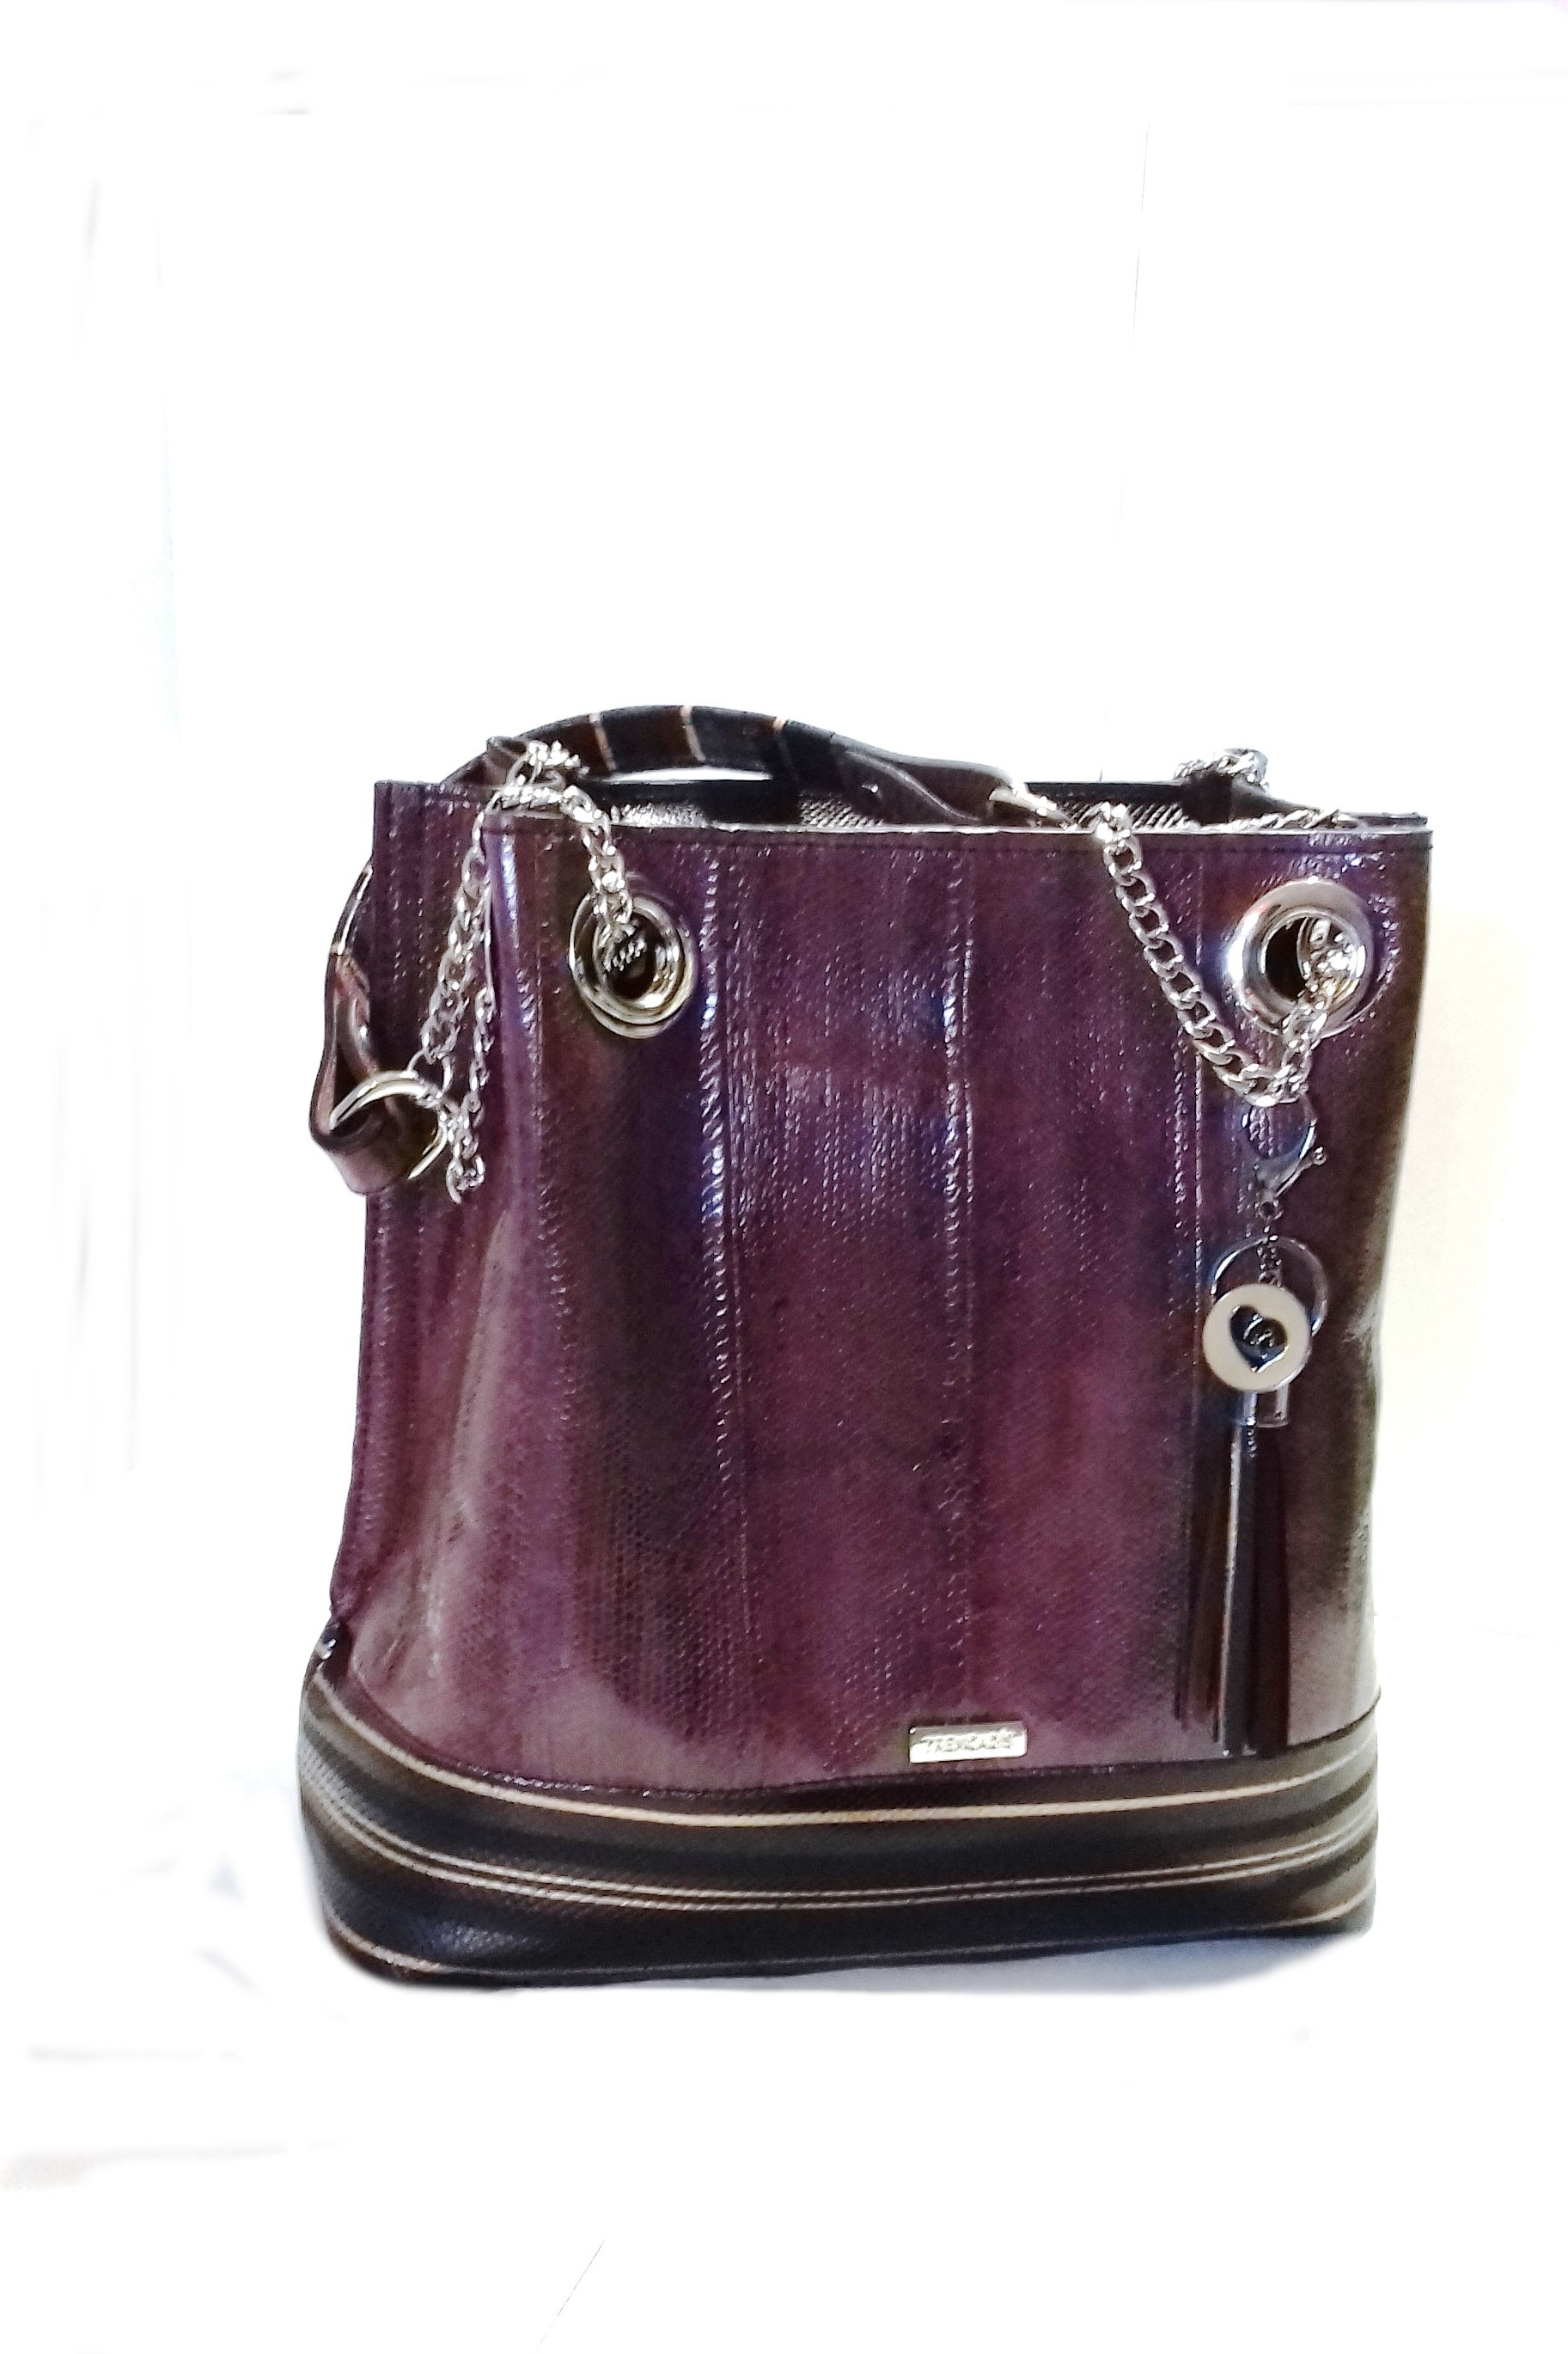 TRENCADIS. Leather bag